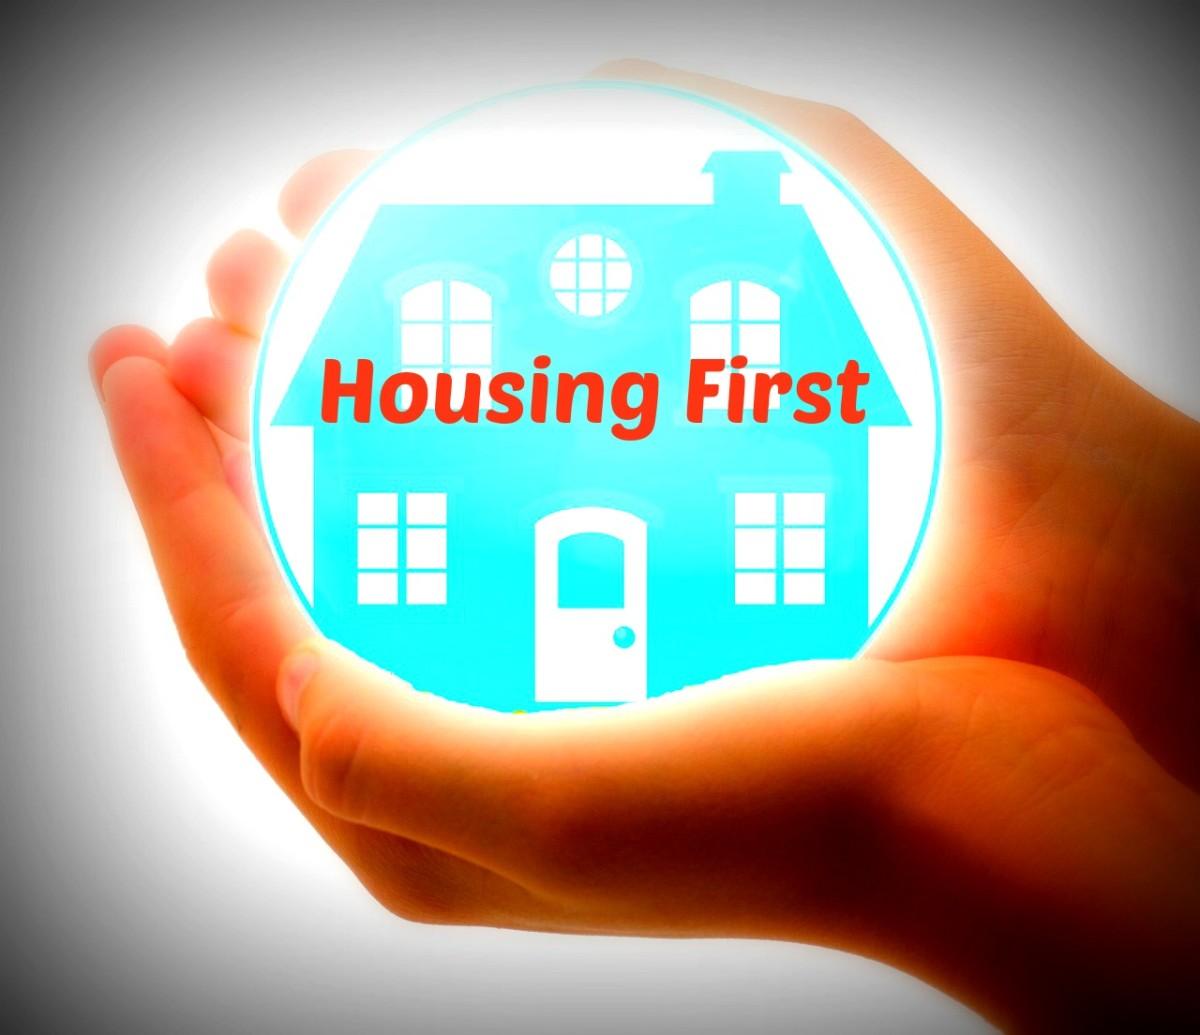 http://pixabay.com/en/house-insurance-protect-home-care-419058/